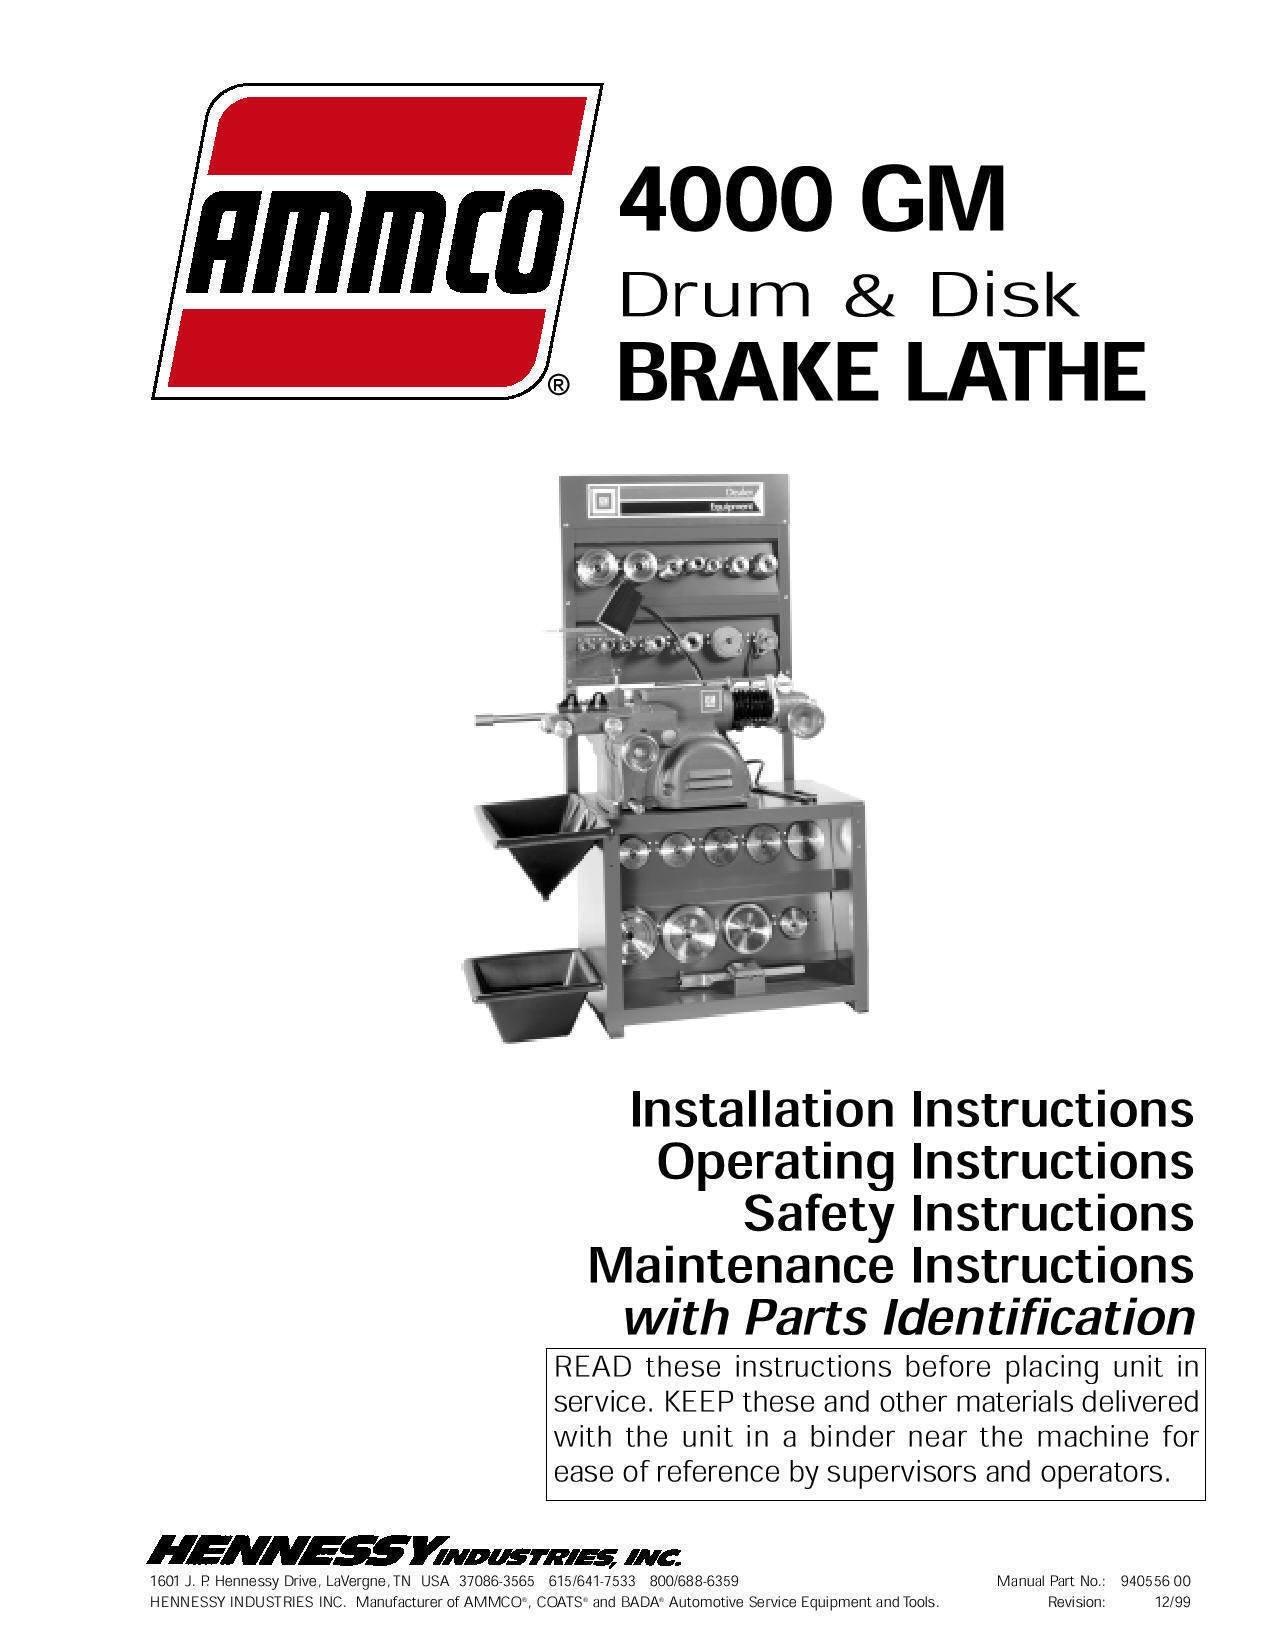 Ammco 4000 Brake Lathe Parts Diagram Ammco Brake Lathe Parts Diagram Man Ammco In Graceful Screnshoots